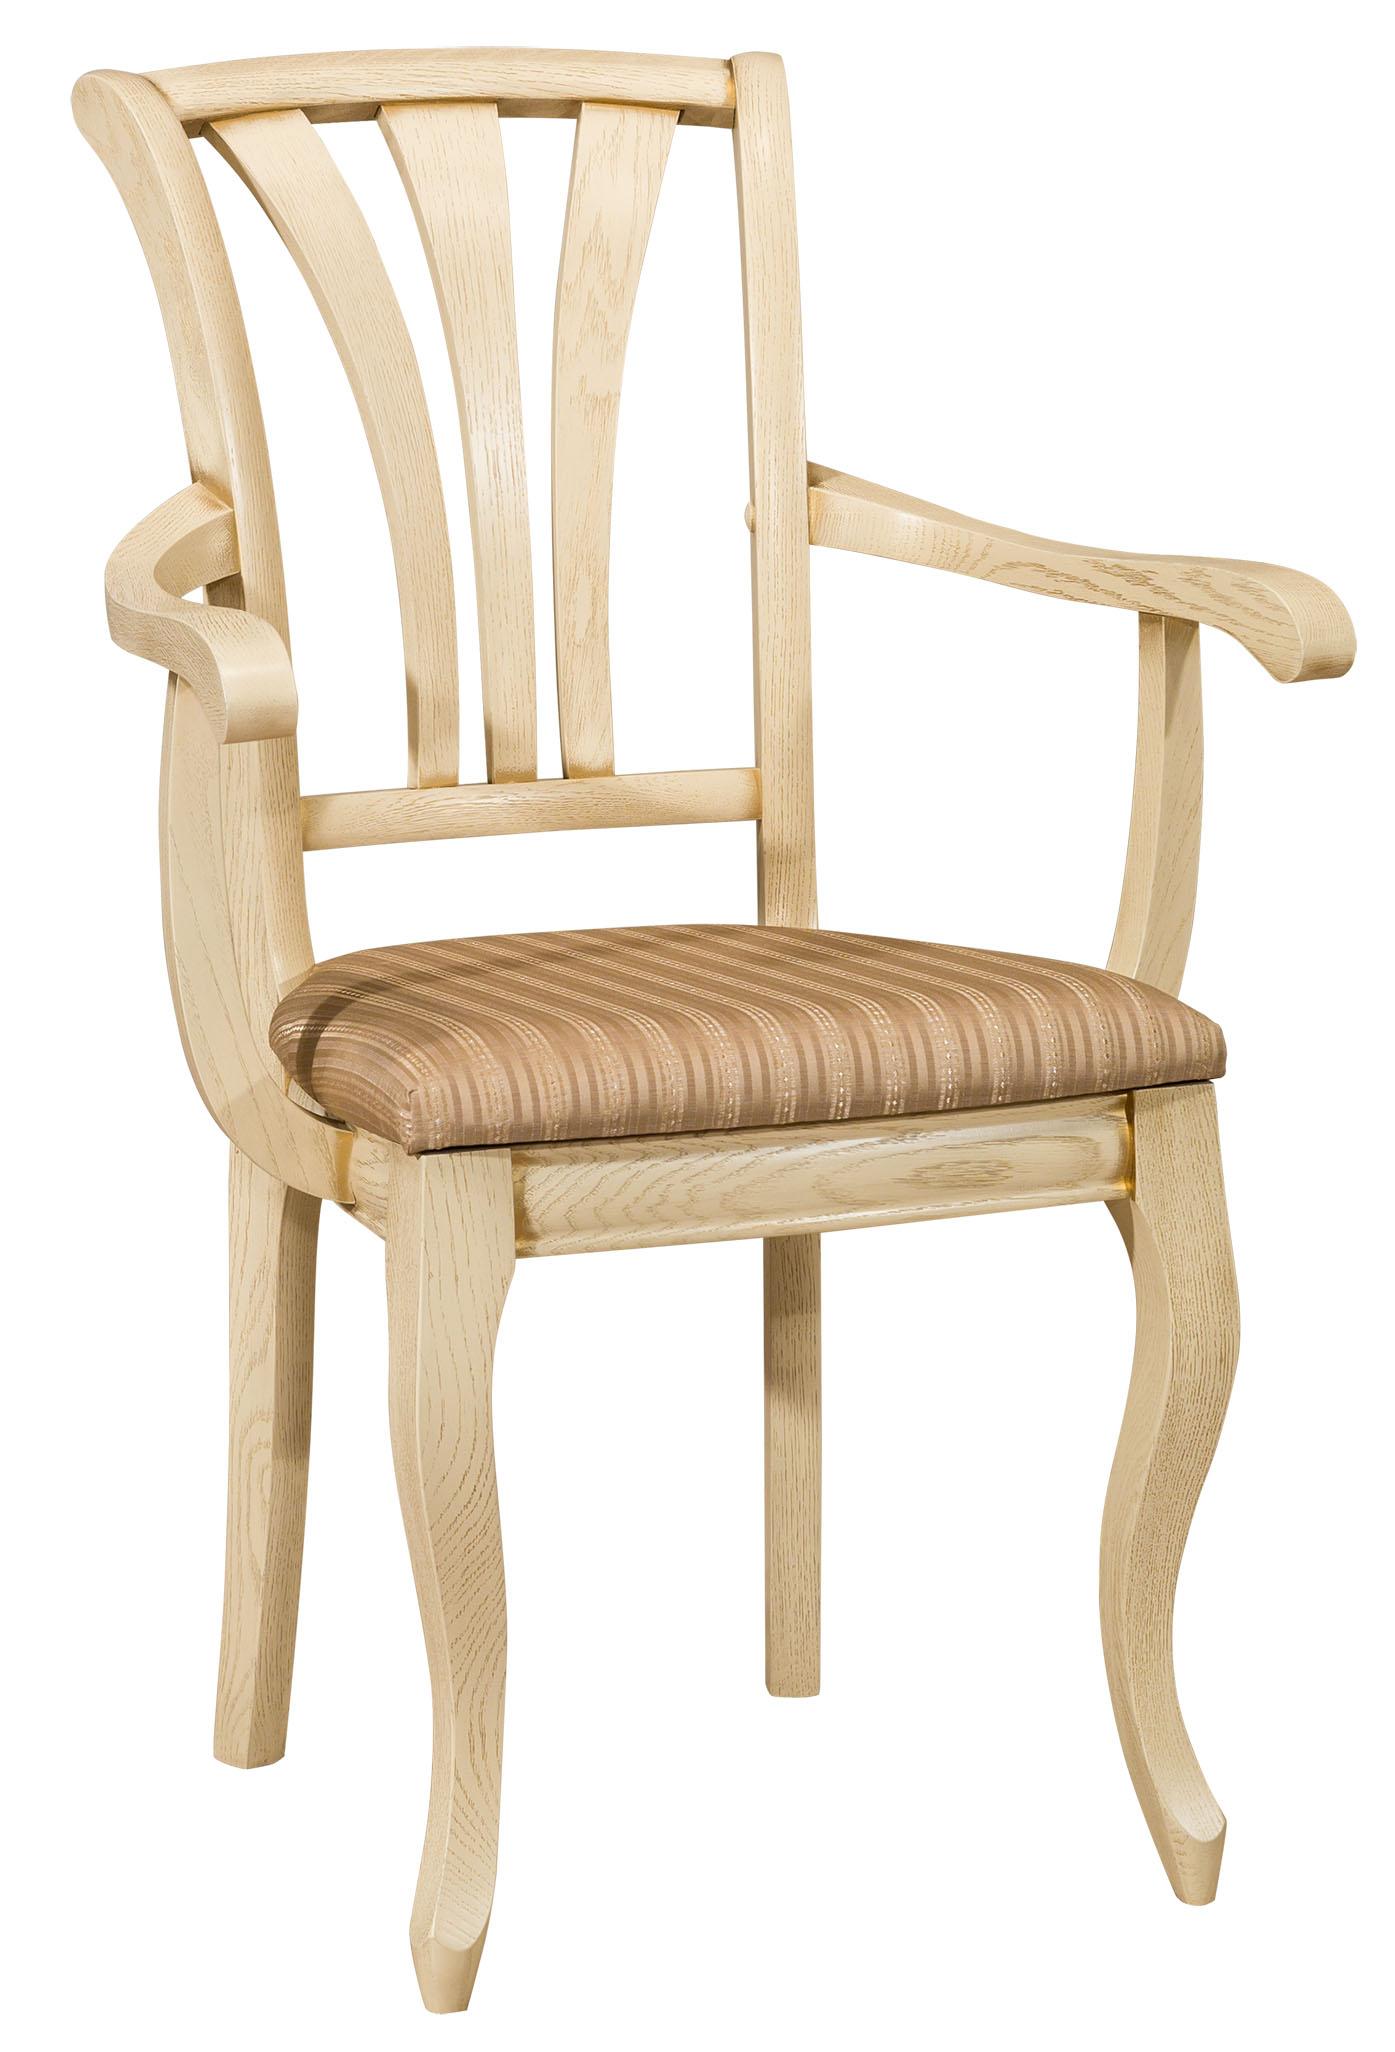 стул (Кресло) Марсель-2